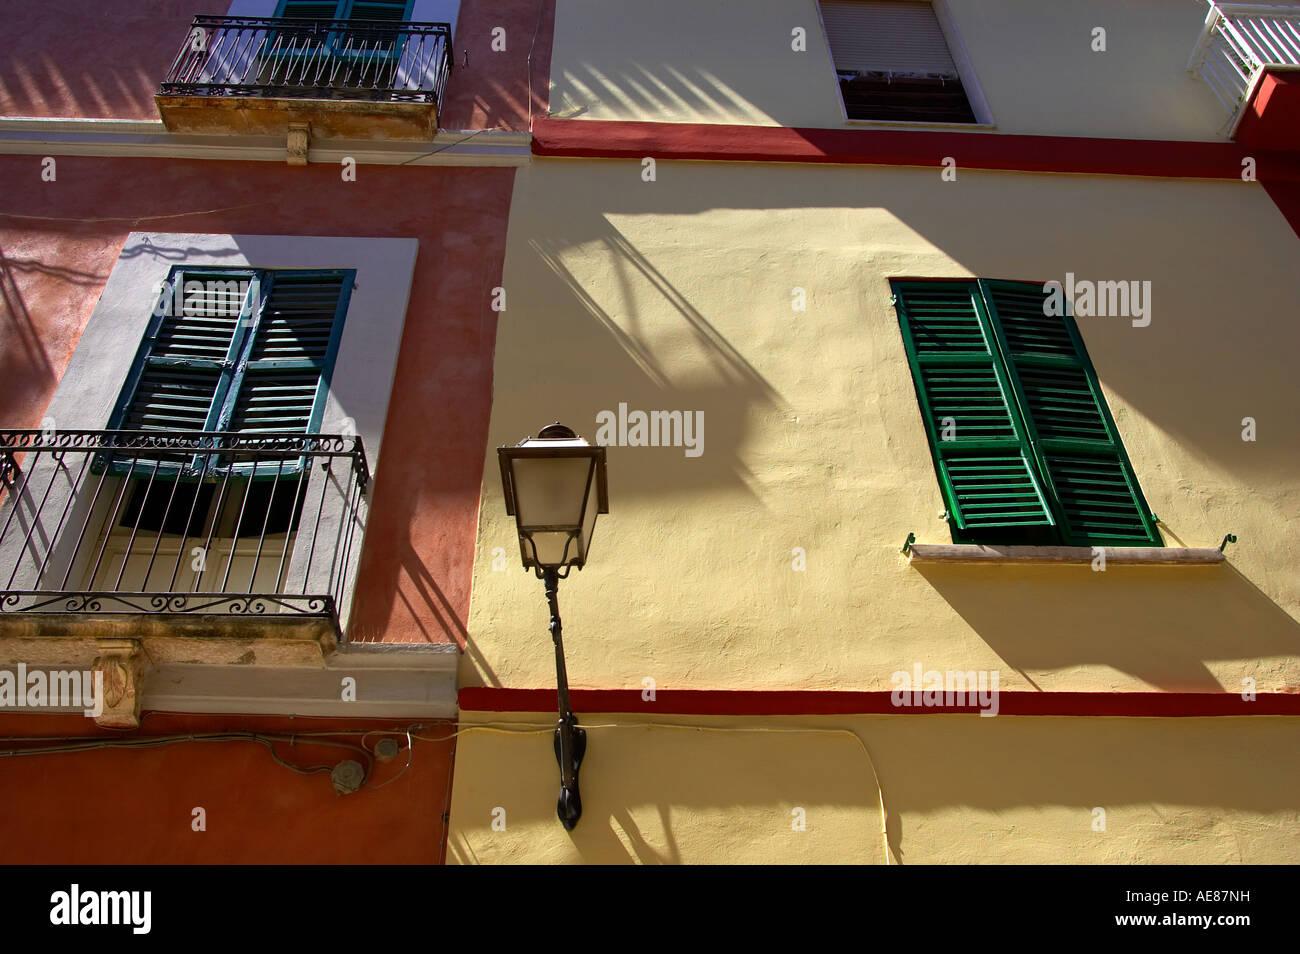 Citta St Angelo near Pescara in the Abruzzo region of Italy. - Stock Image